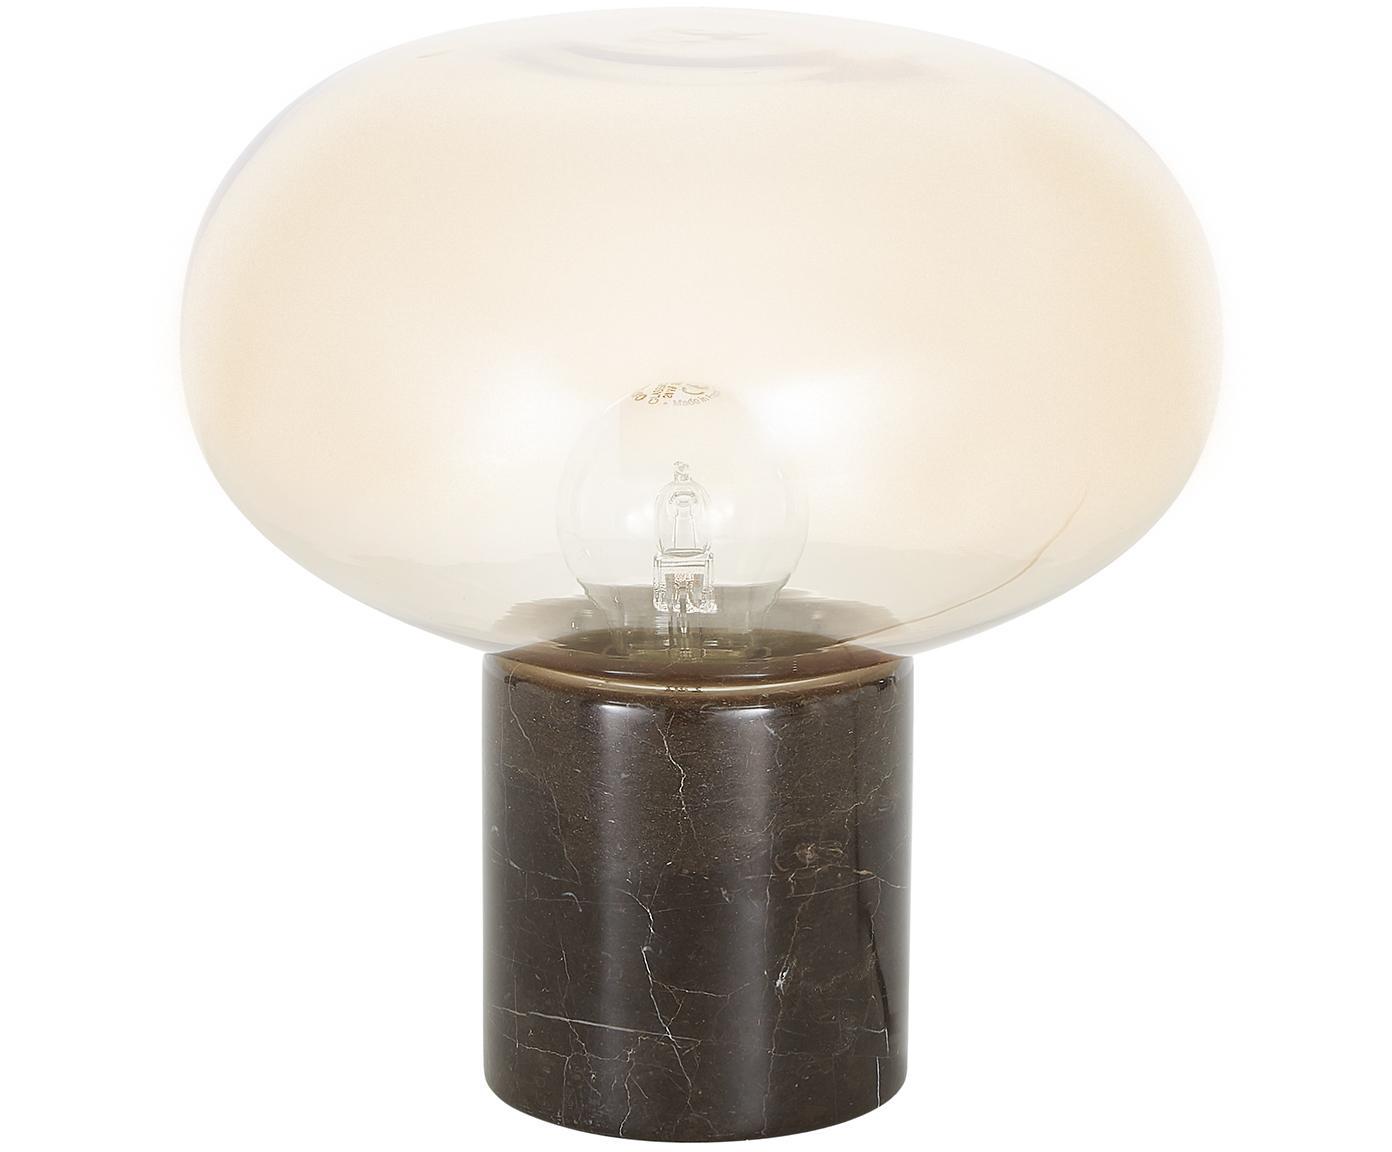 Lámpara de mesa de mármol Alma, Pantalla: vidrio, Cable: cubierto en tela, Base: mármol marrón Pantalla: ámbar, transparente Cable: negro, Ø 23 x Al 24 cm